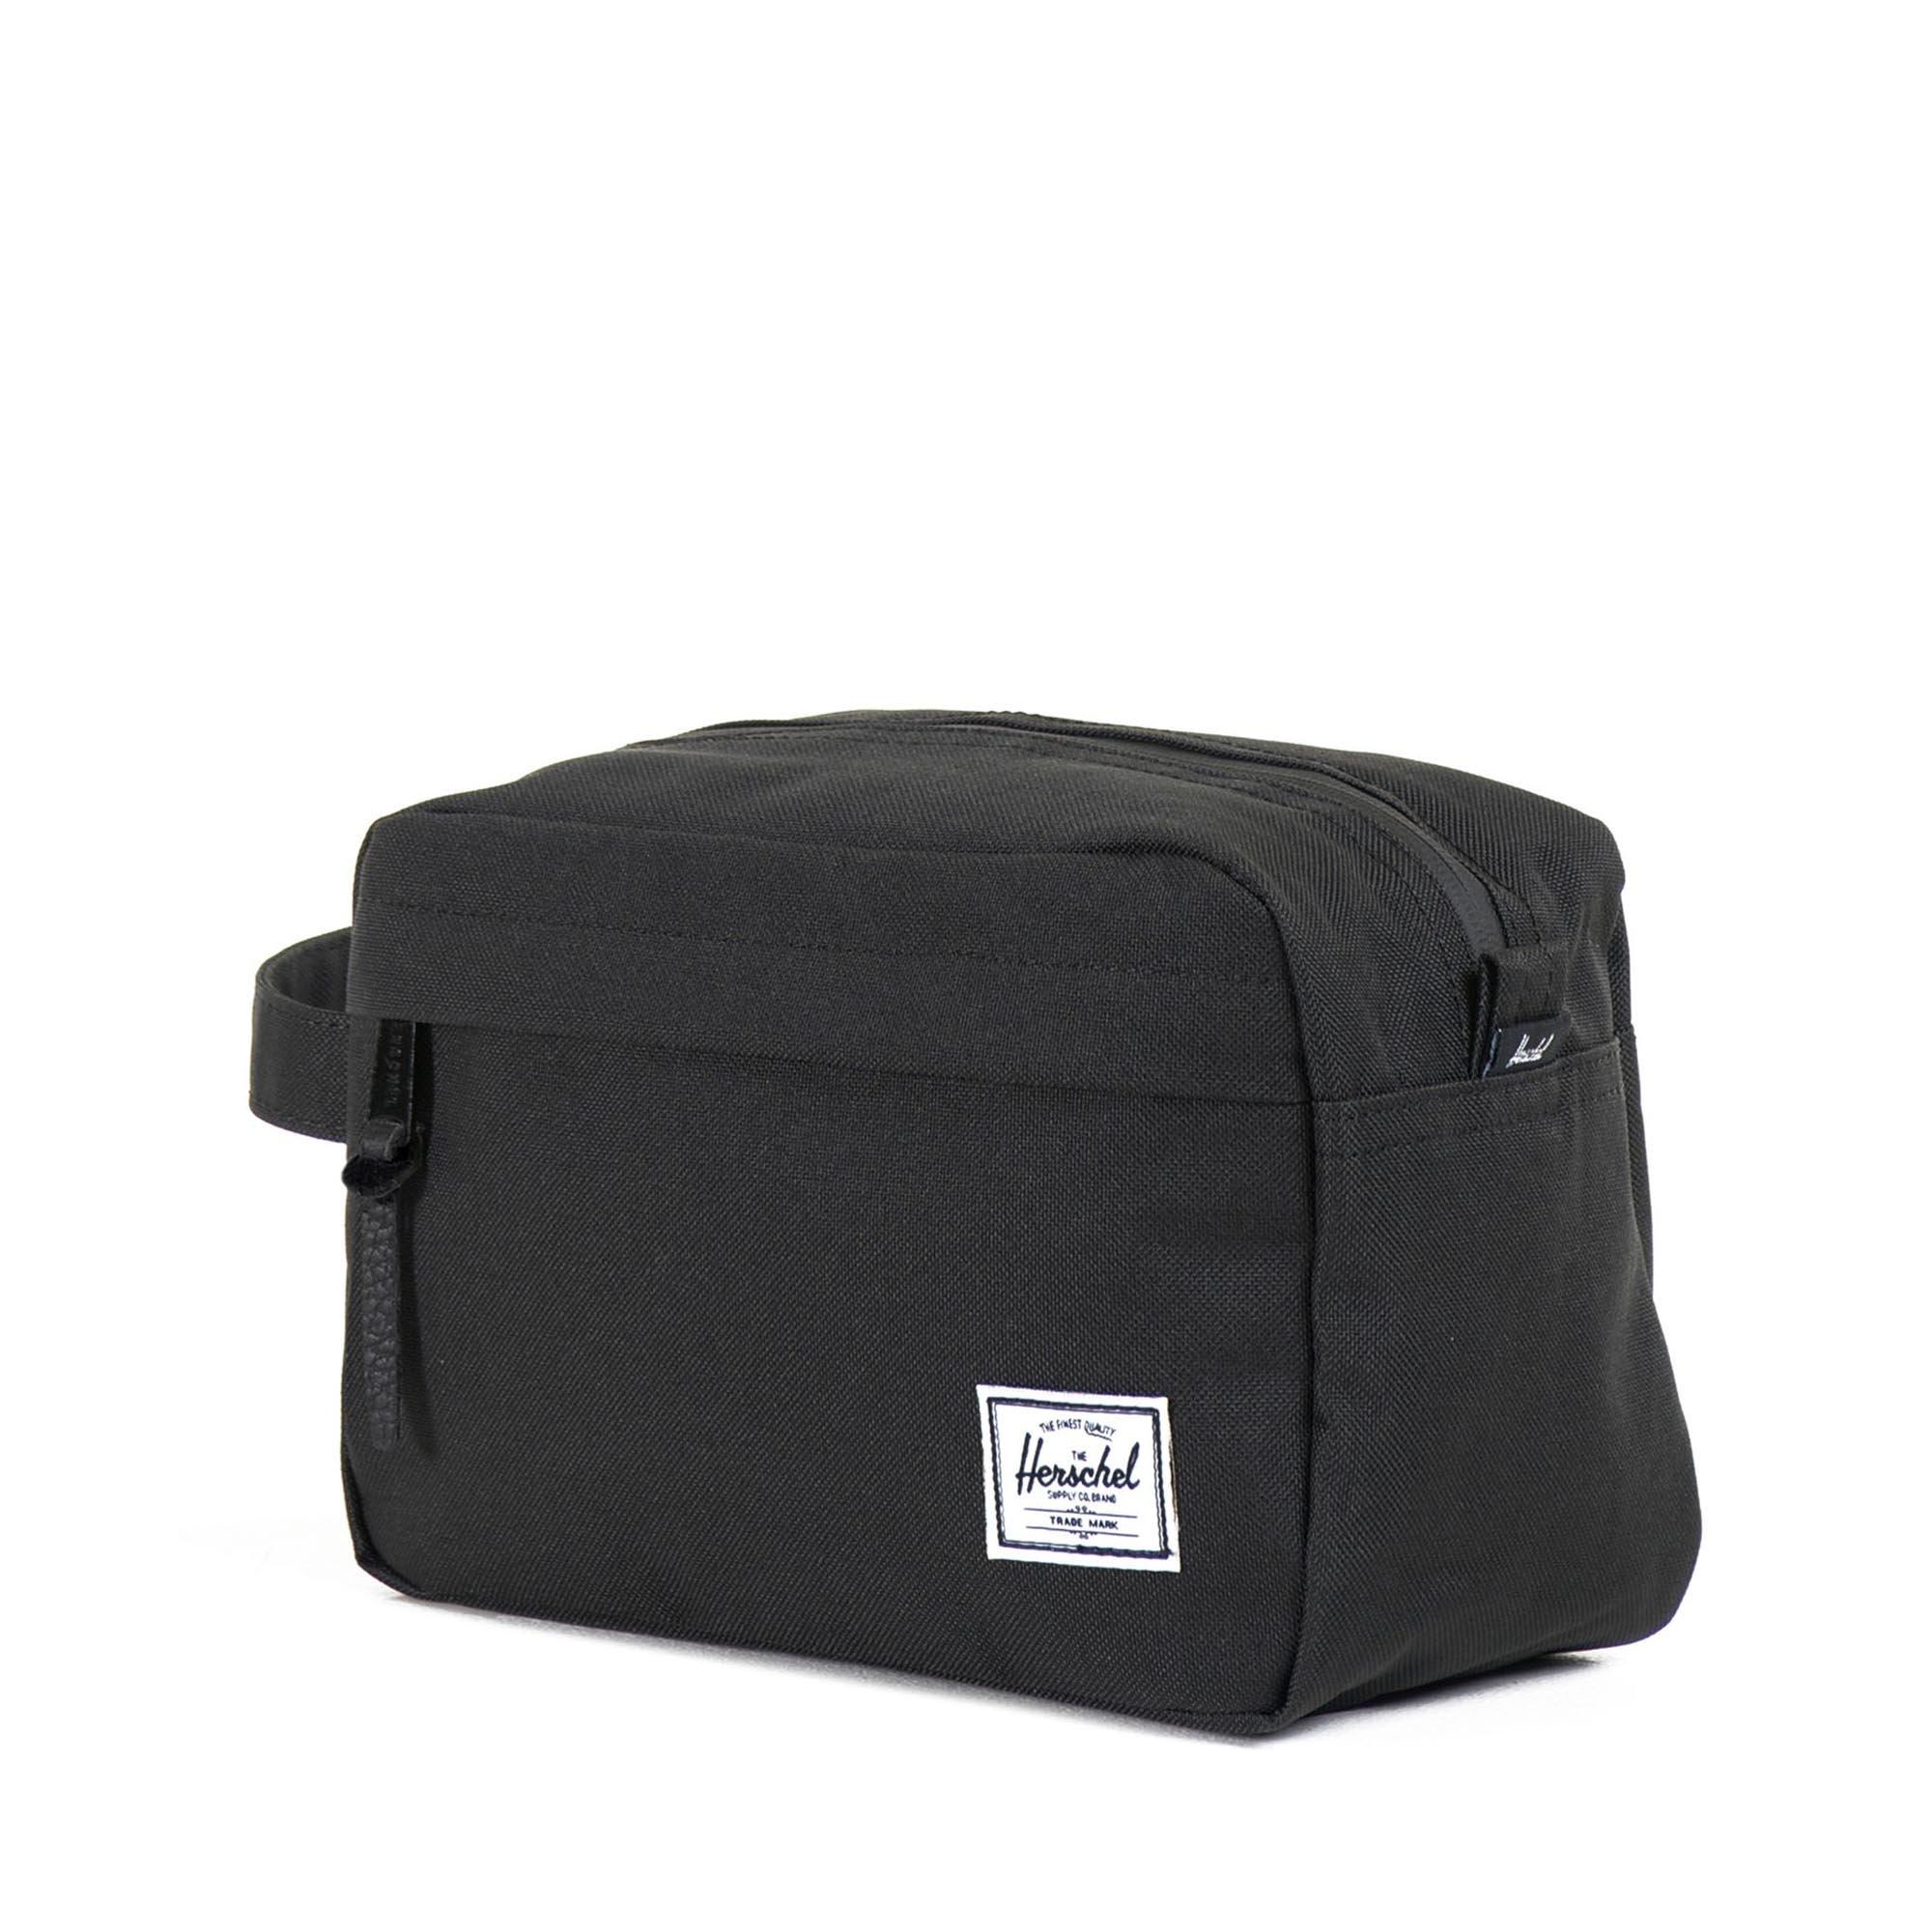 Herschel Supply Co. Chapter Travel Kit,Black,One Size by Herschel Supply Co. (Image #9)